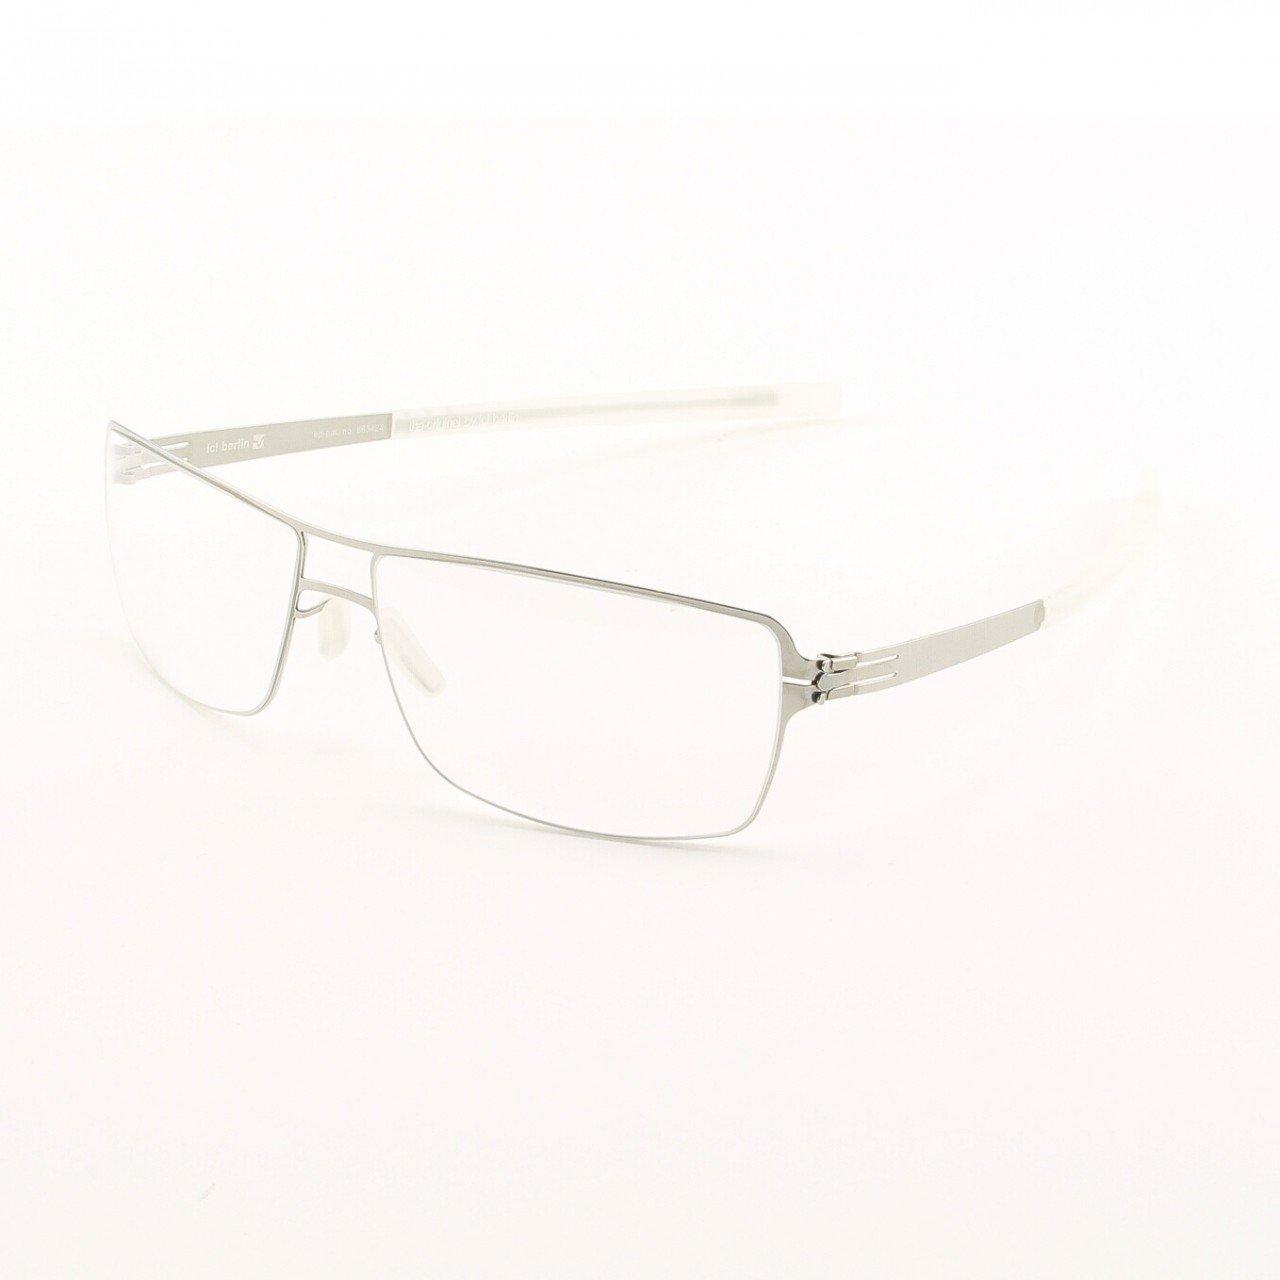 ic! Berlin Duke Eyeglasses Col. Chrome with Clear Lenses